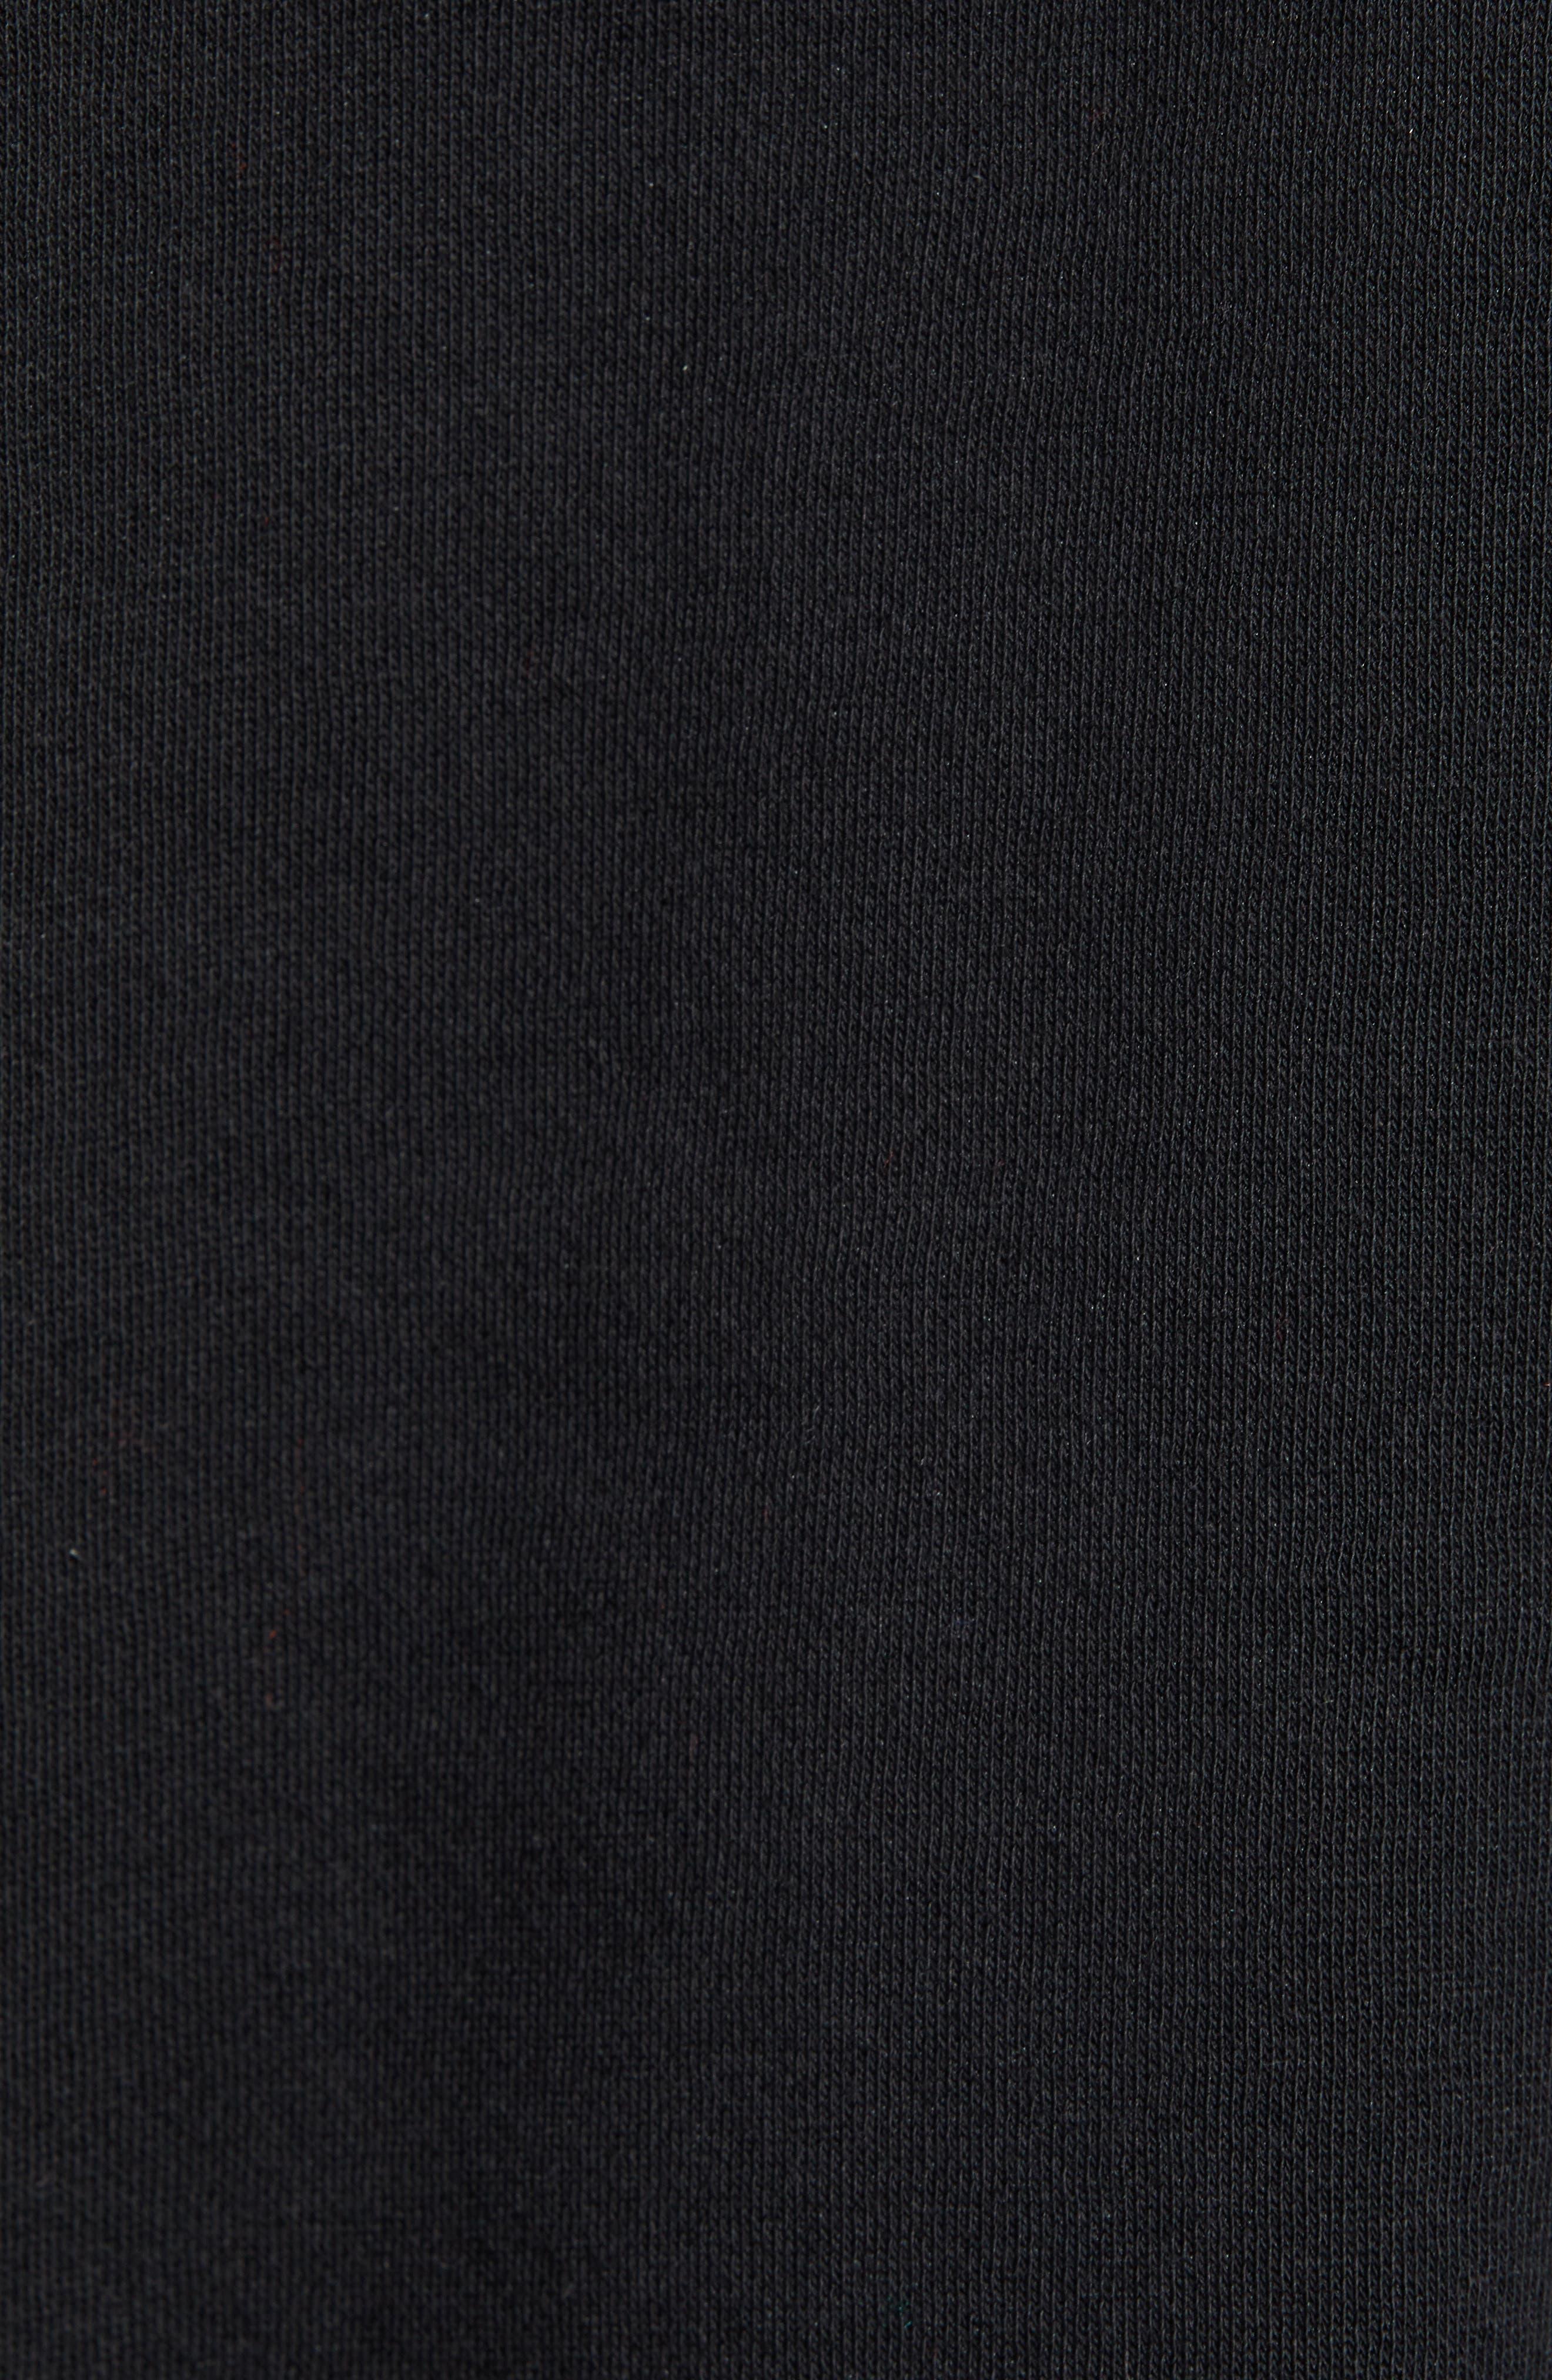 Bzaleh Hoodie,                             Alternate thumbnail 6, color,                             BLACK/ WHITE